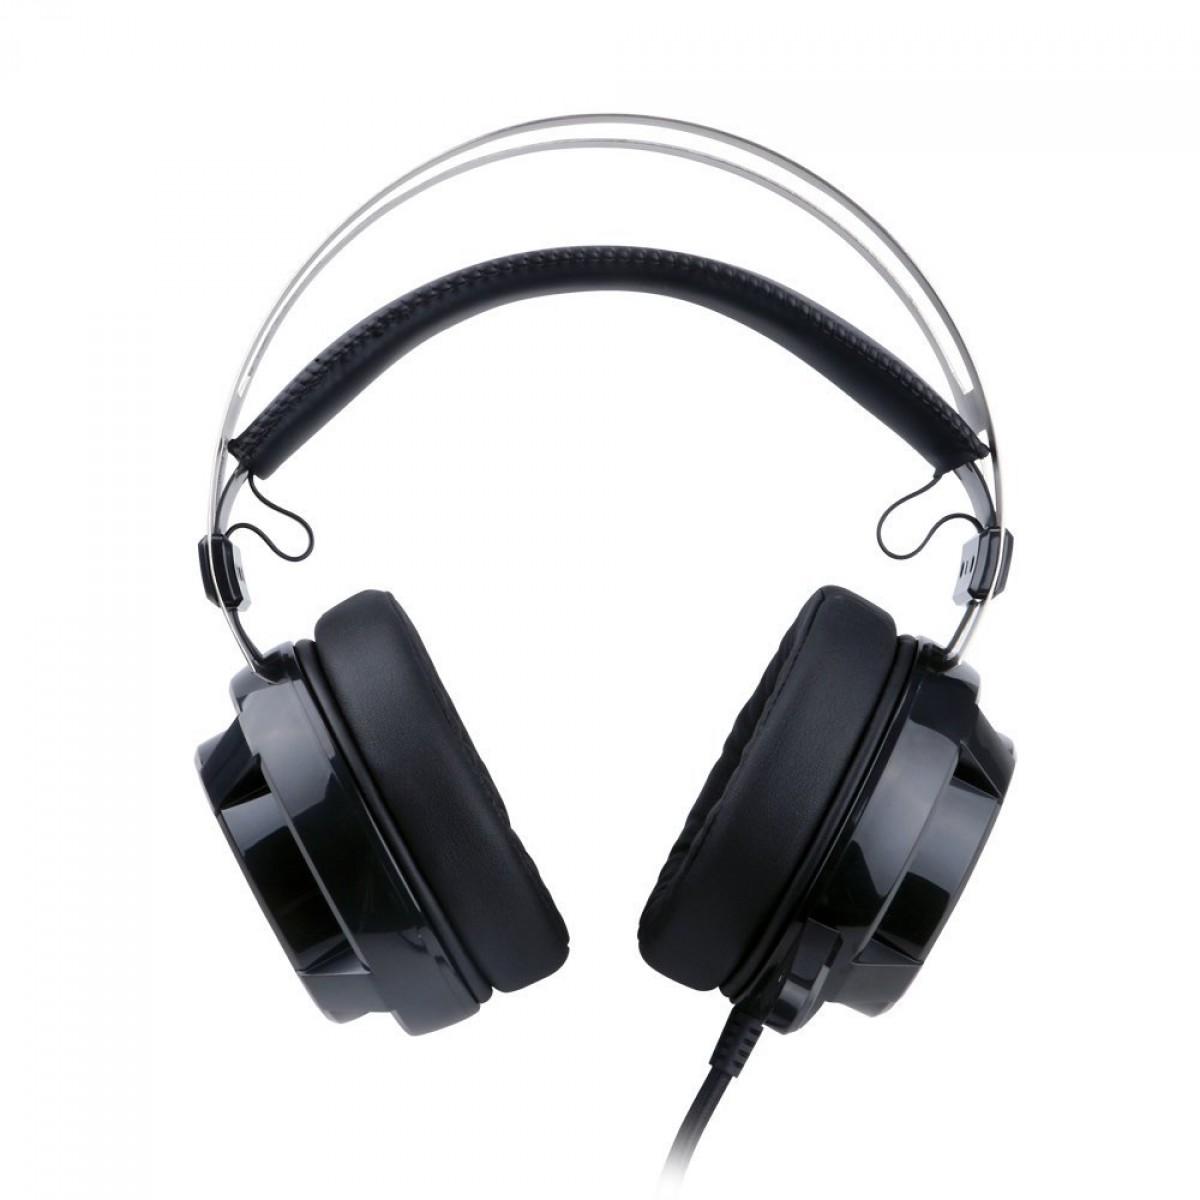 Headset Gamer Redragon Siren 2, USB, 7.1 Surround, Black, H301USB-1